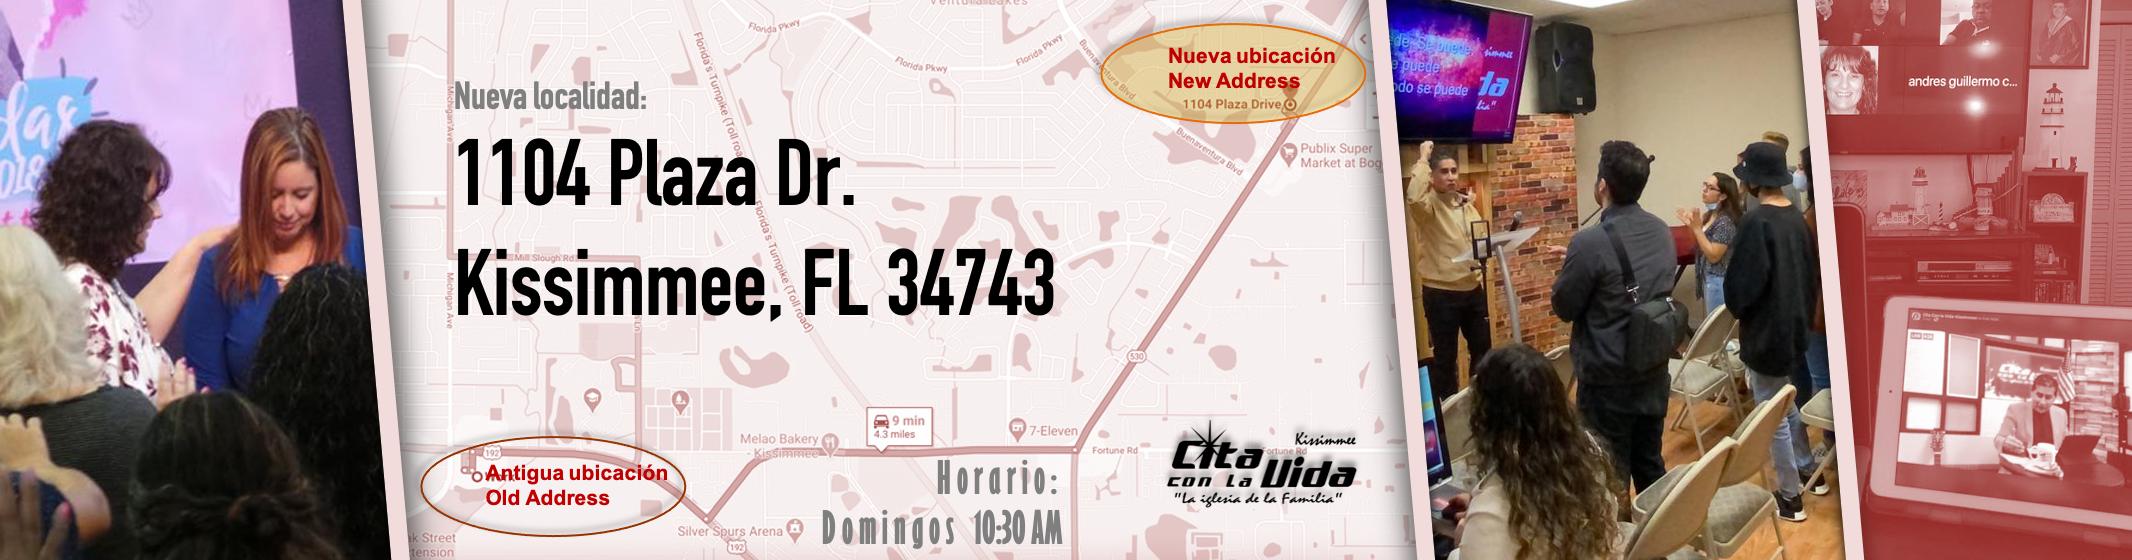 nvo lugar 1104 plaza dr